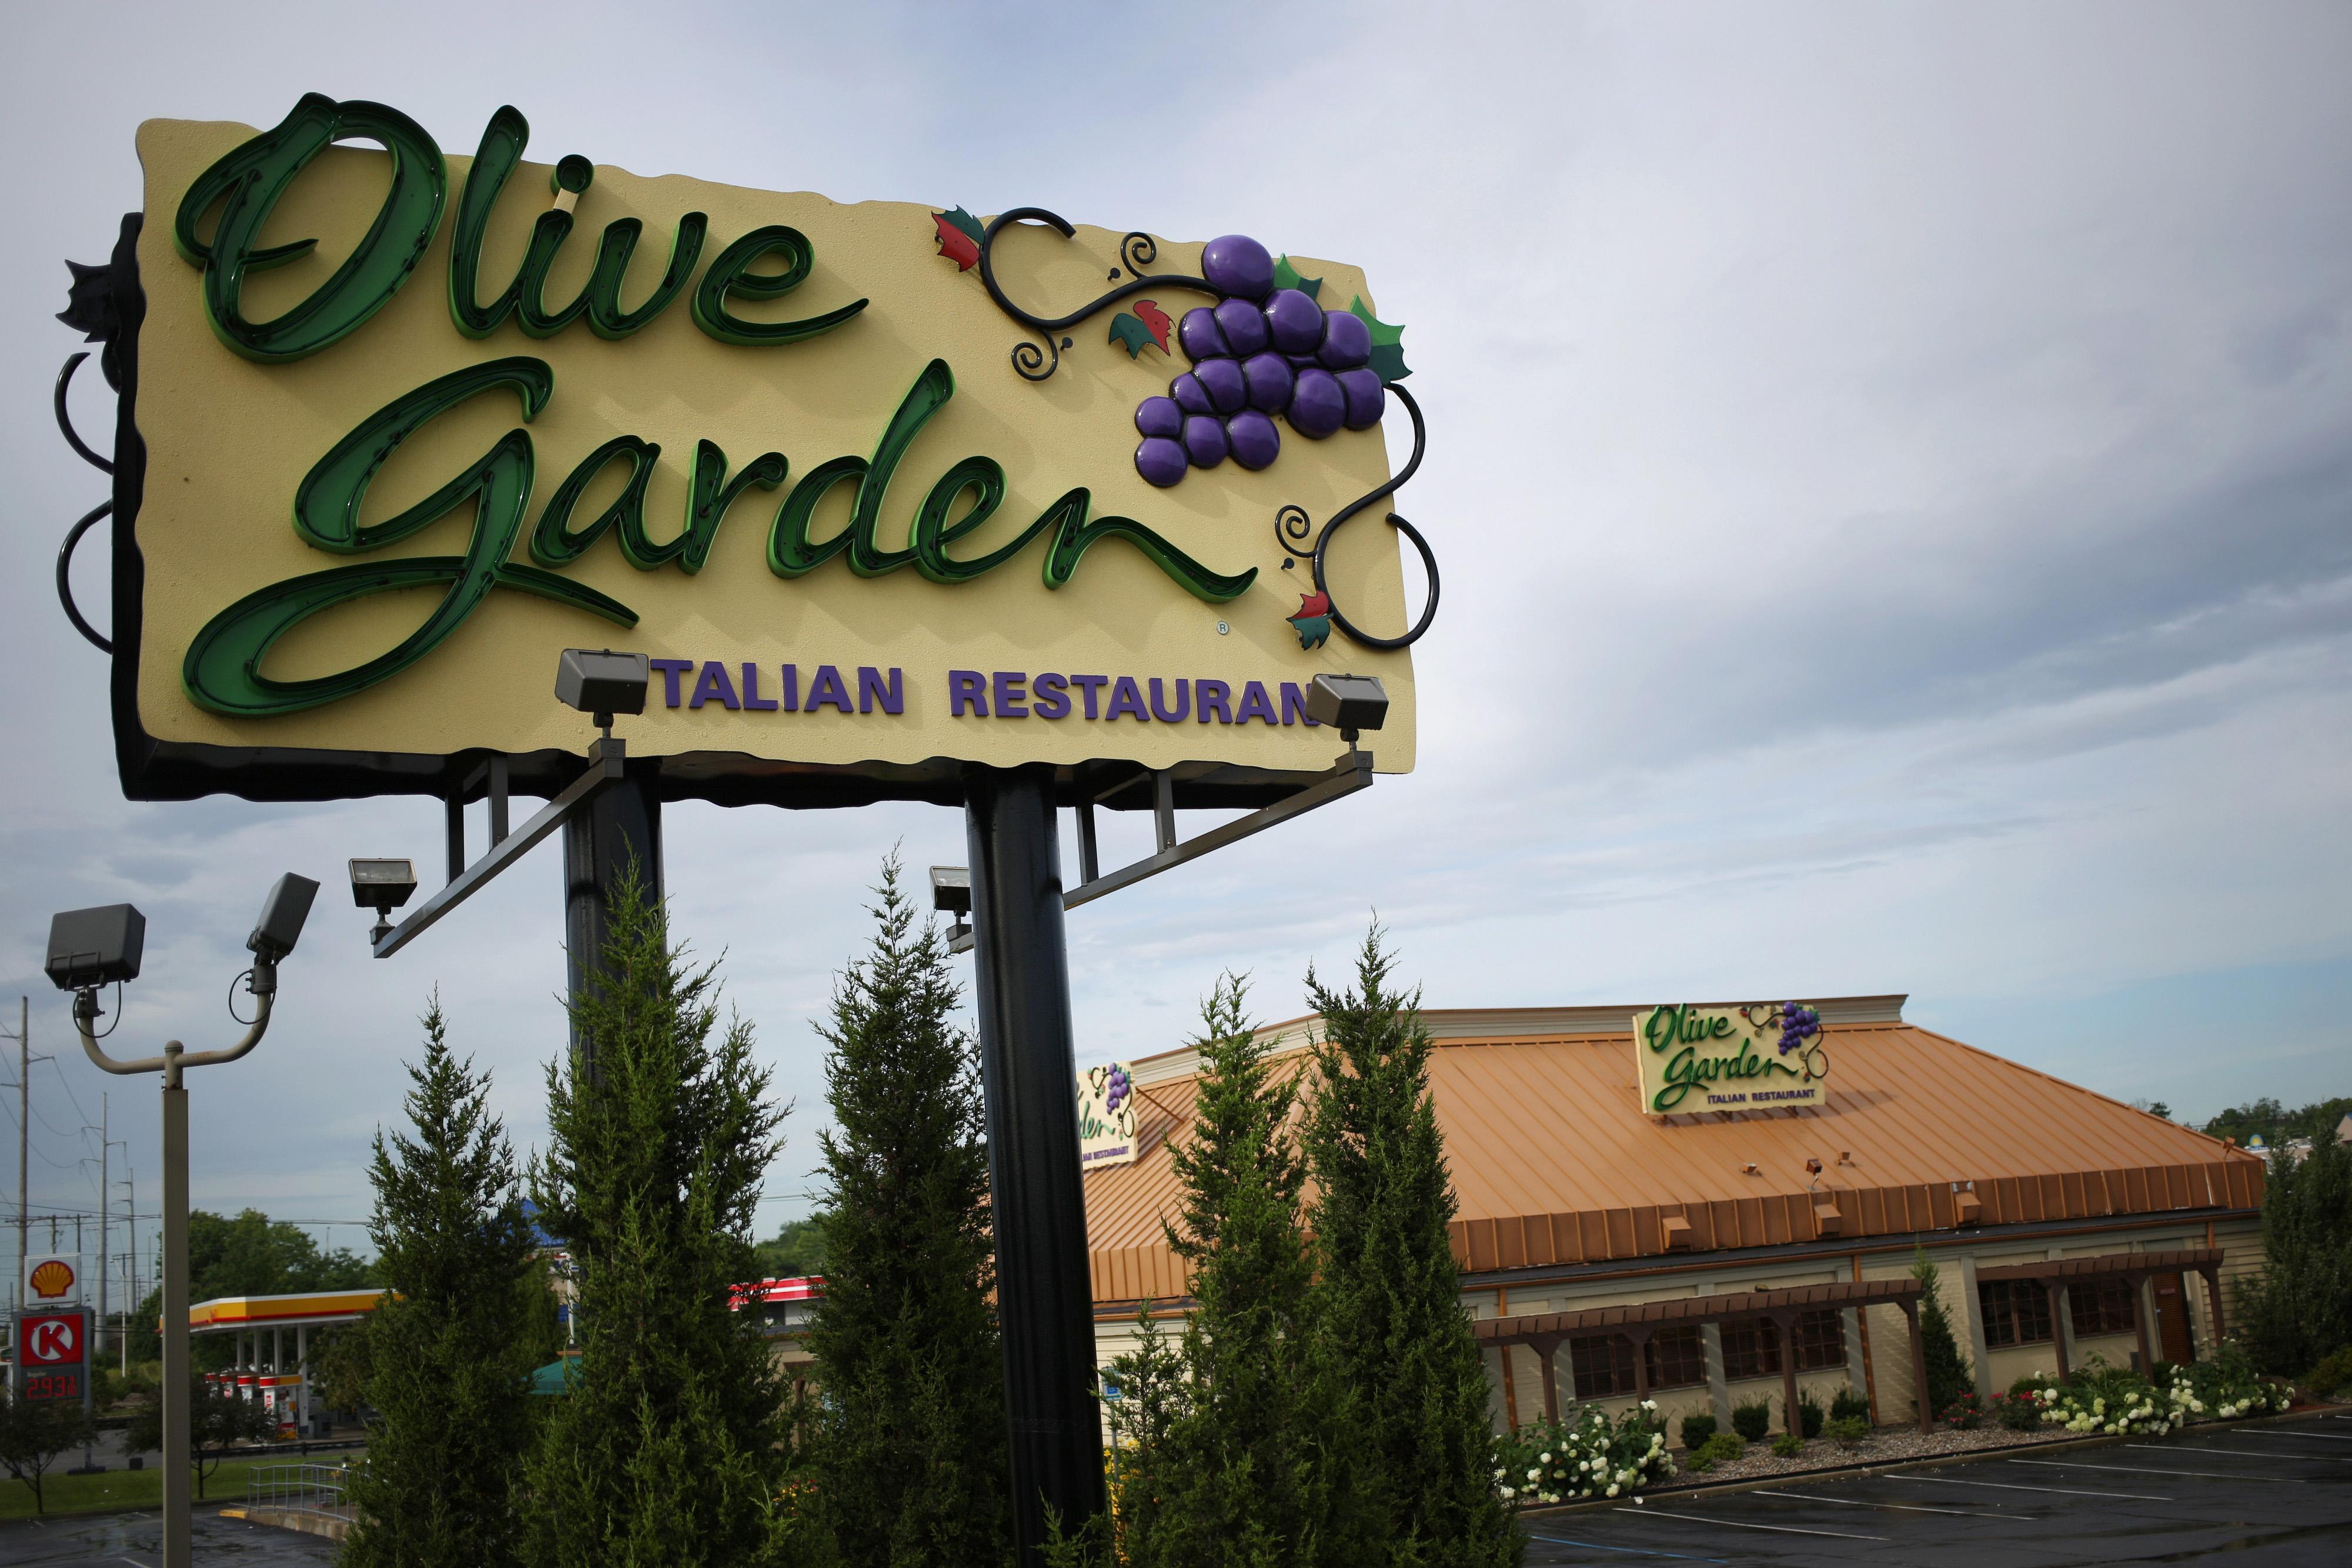 Olive Garden restaurant in Louisville, Kentucky, on June 22, 2015.